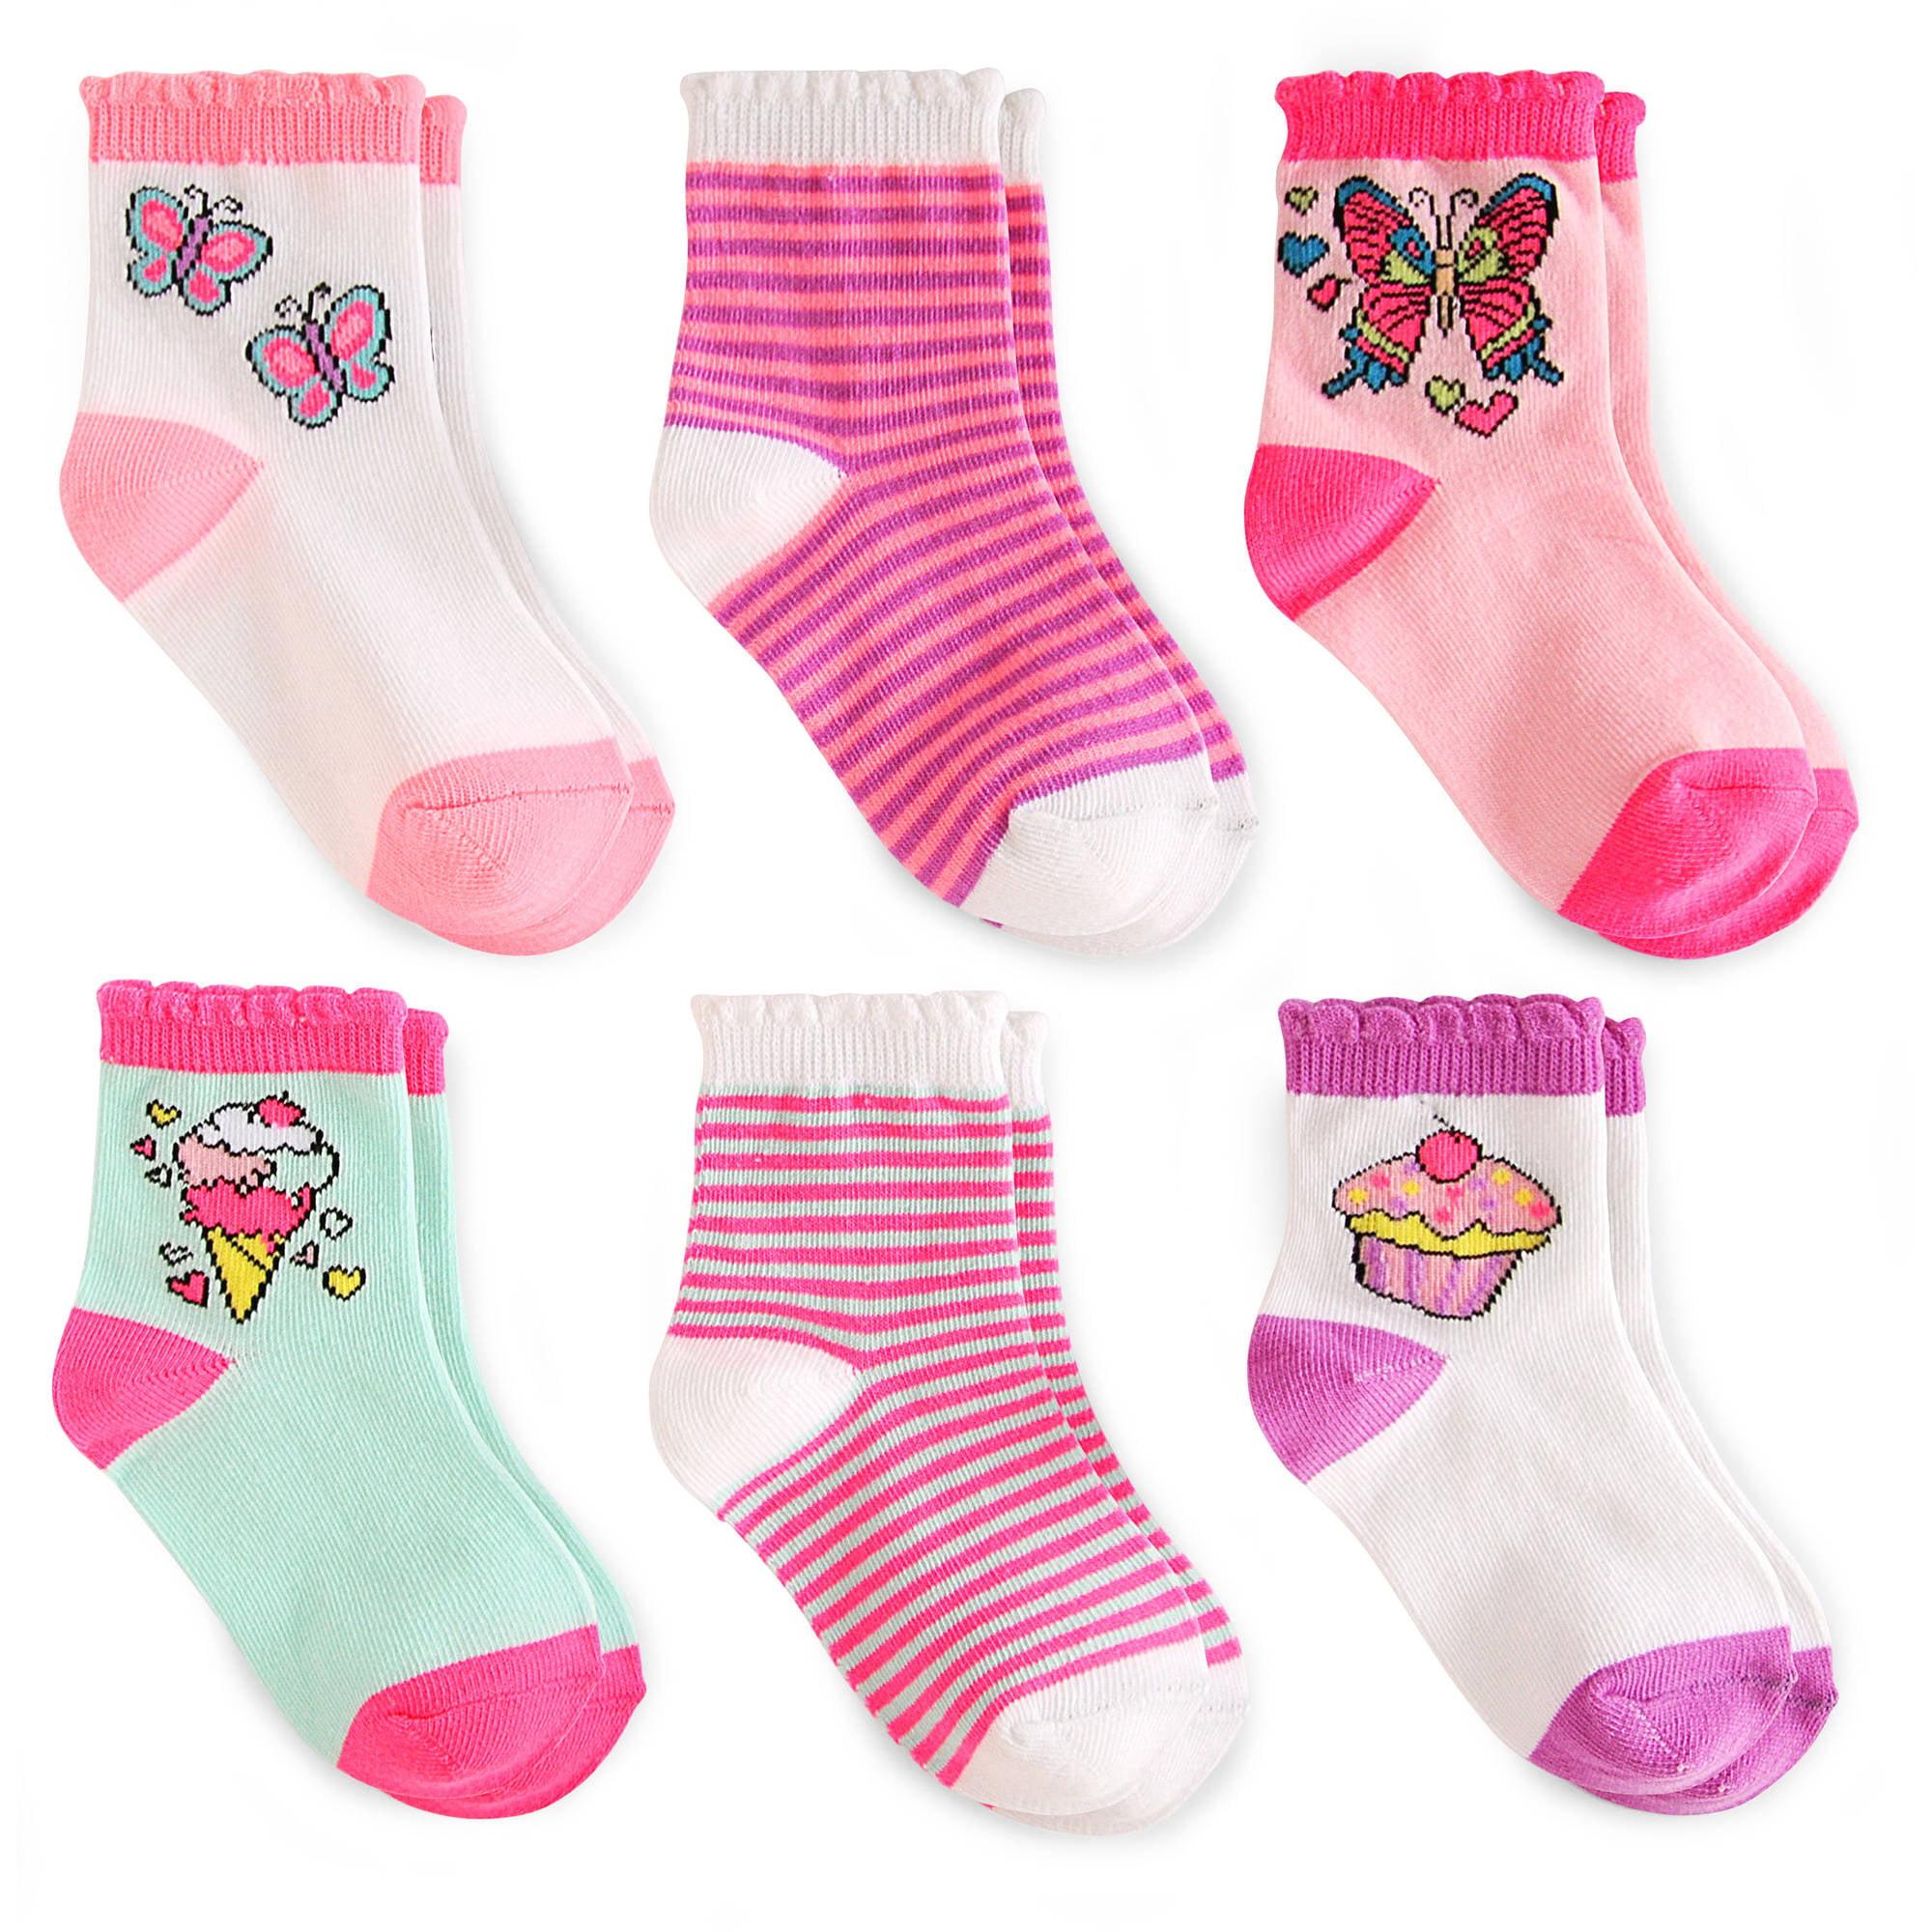 Garanimals Baby Toddler Girls Crew Socks Ages NB-5T, 6-Pack